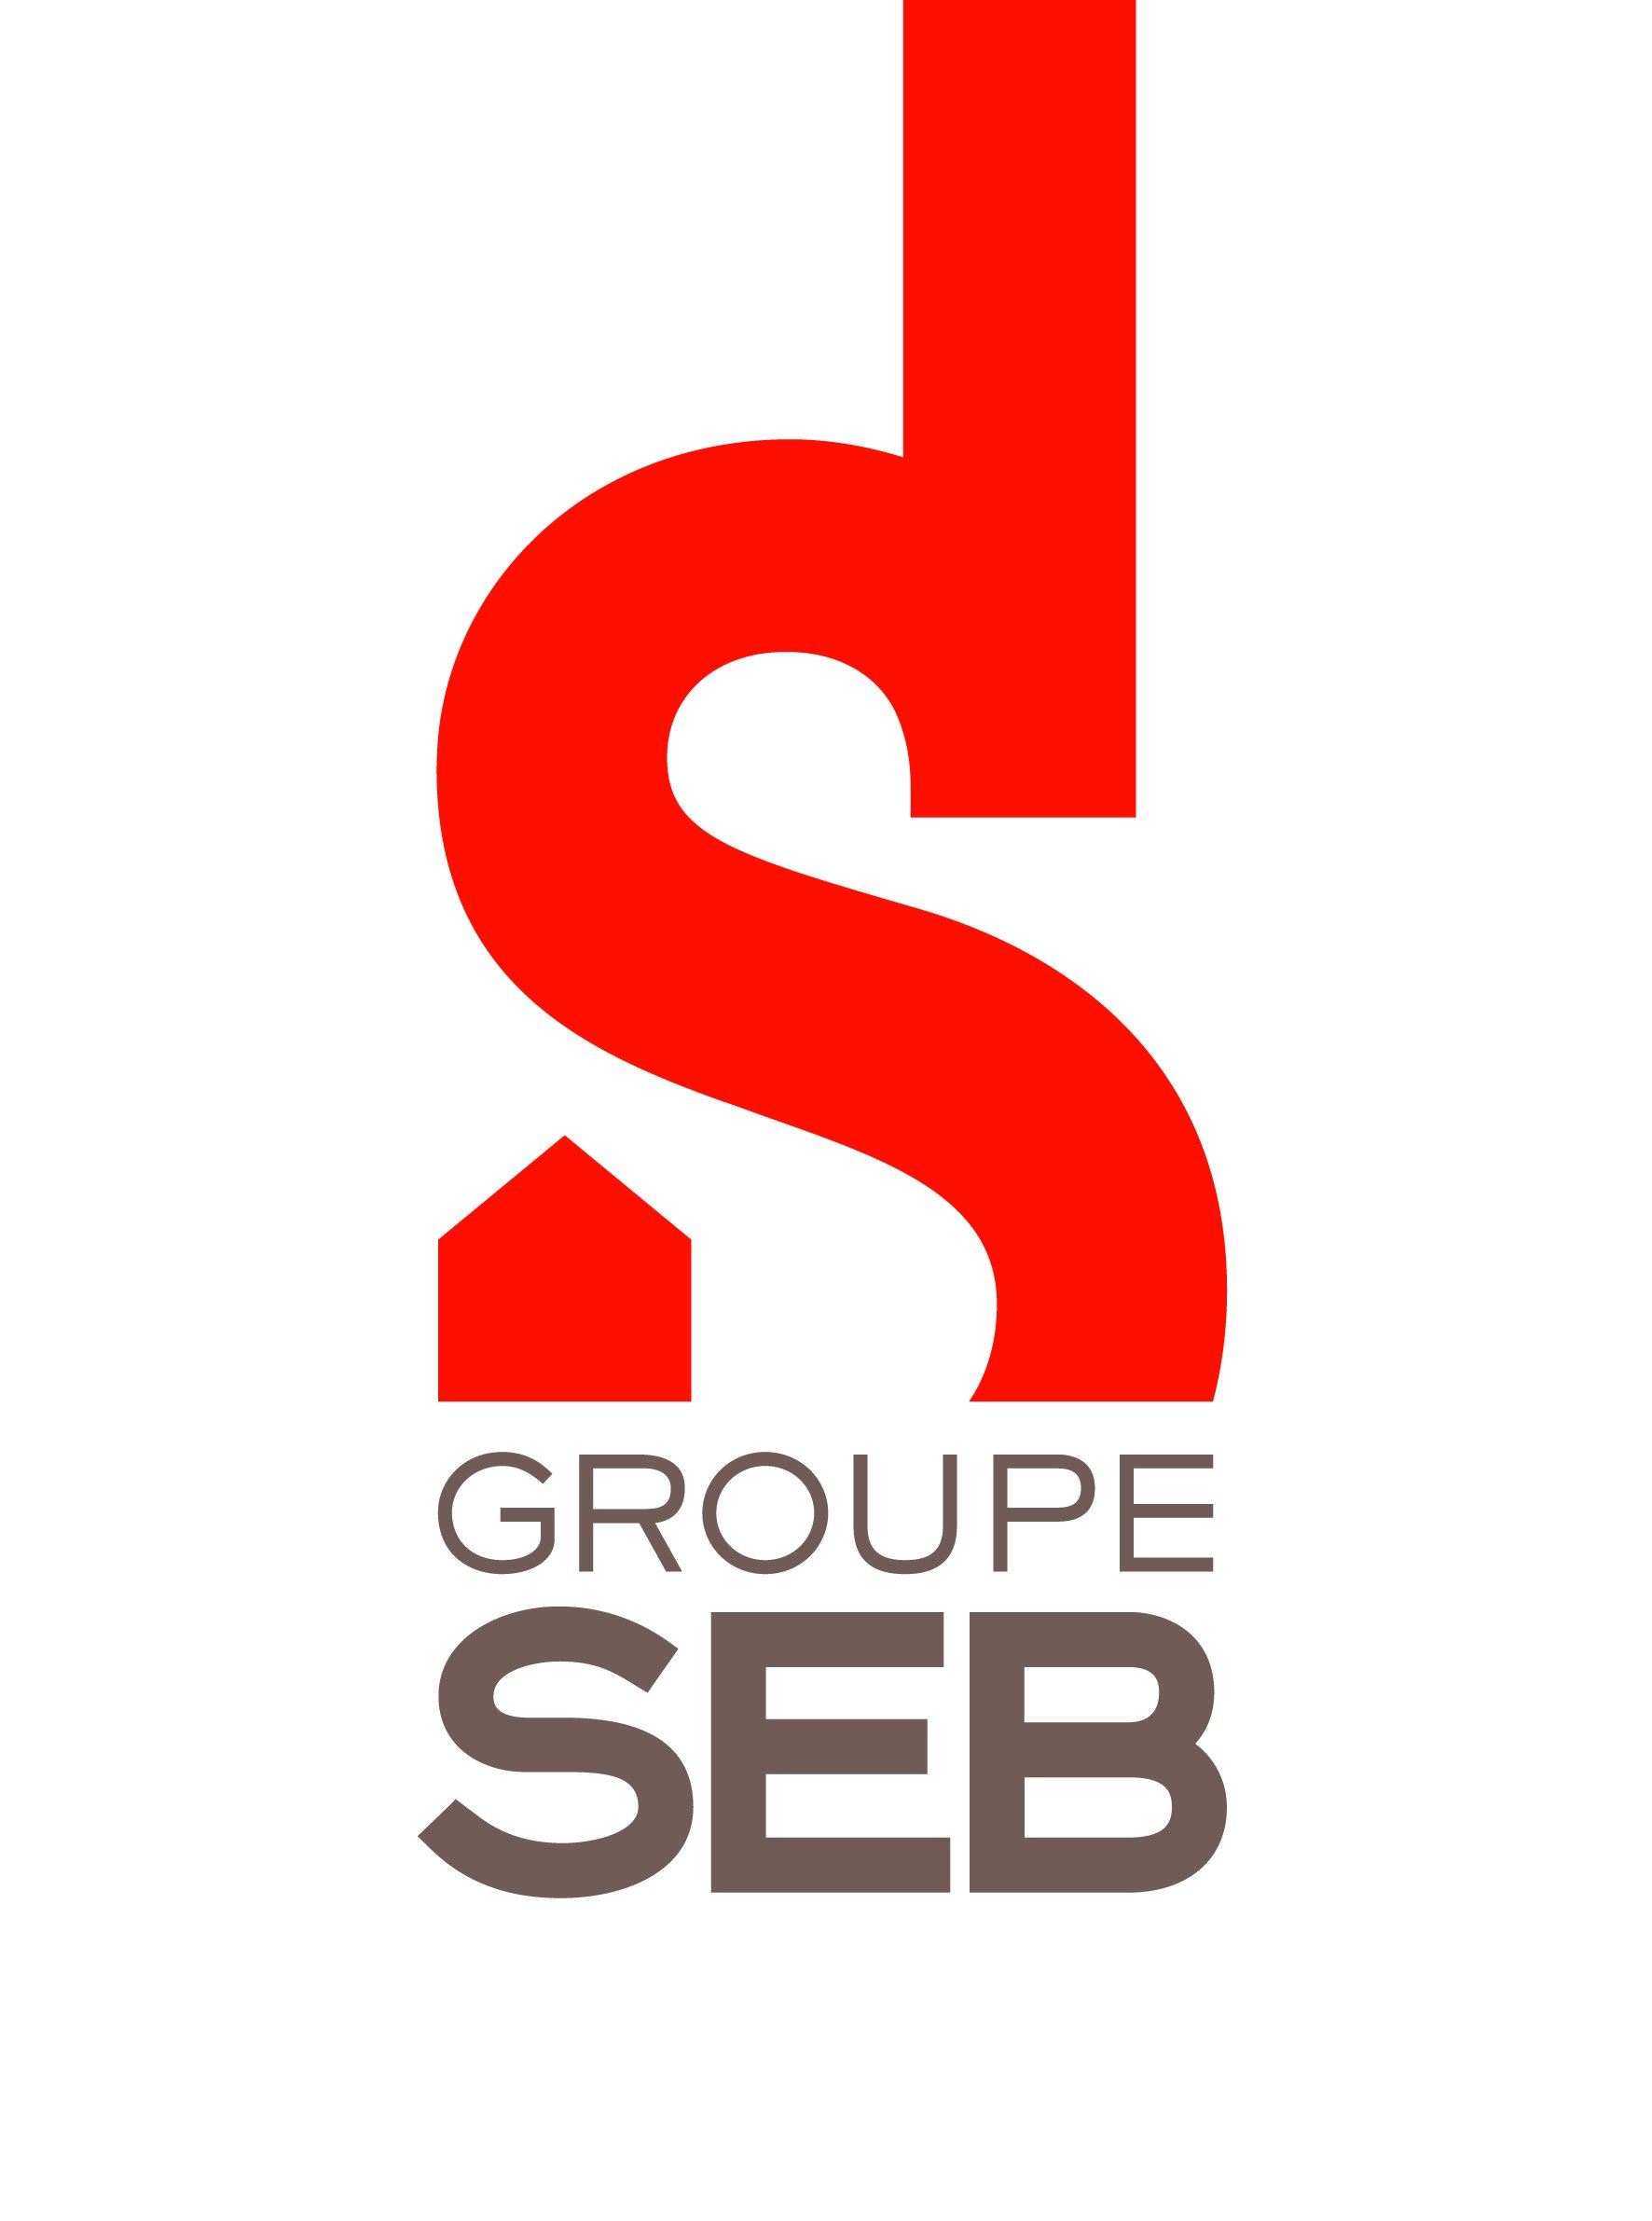 B1 GroupeSEB logotype maitre